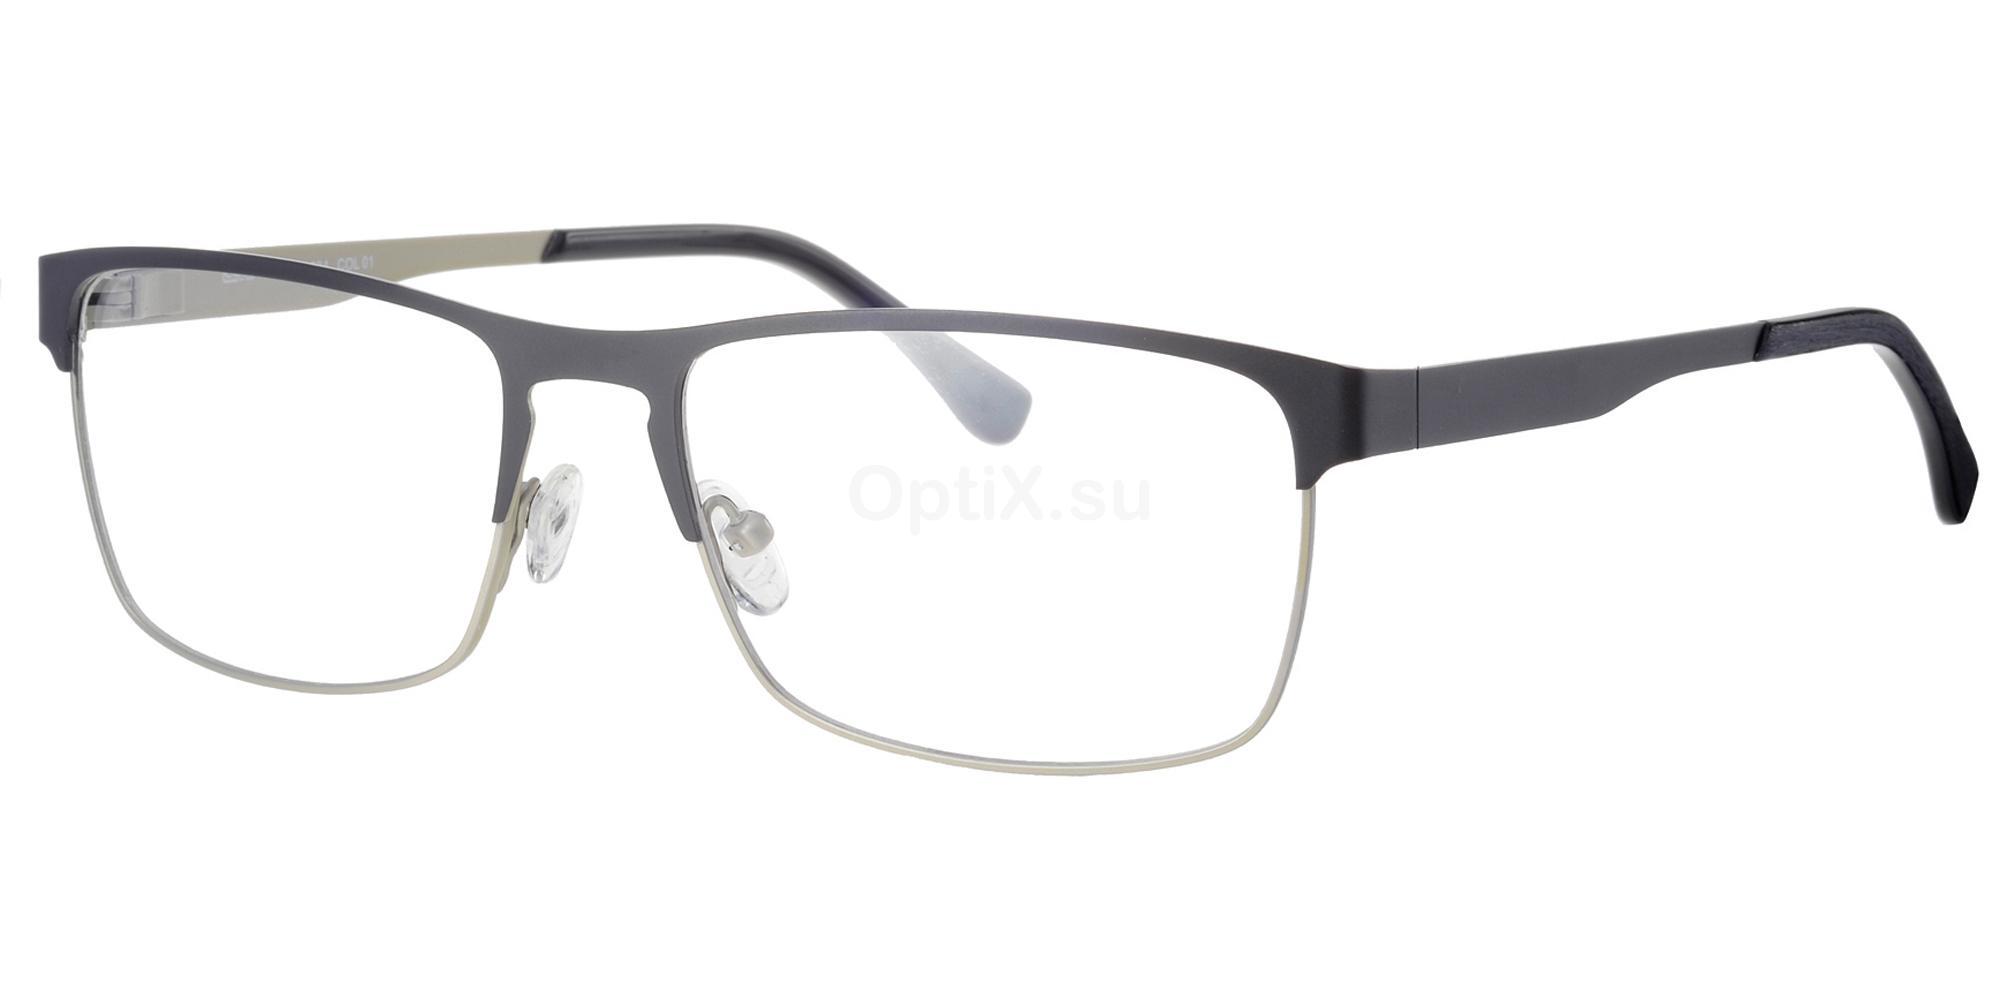 C01 3534 Glasses, Colt for Men